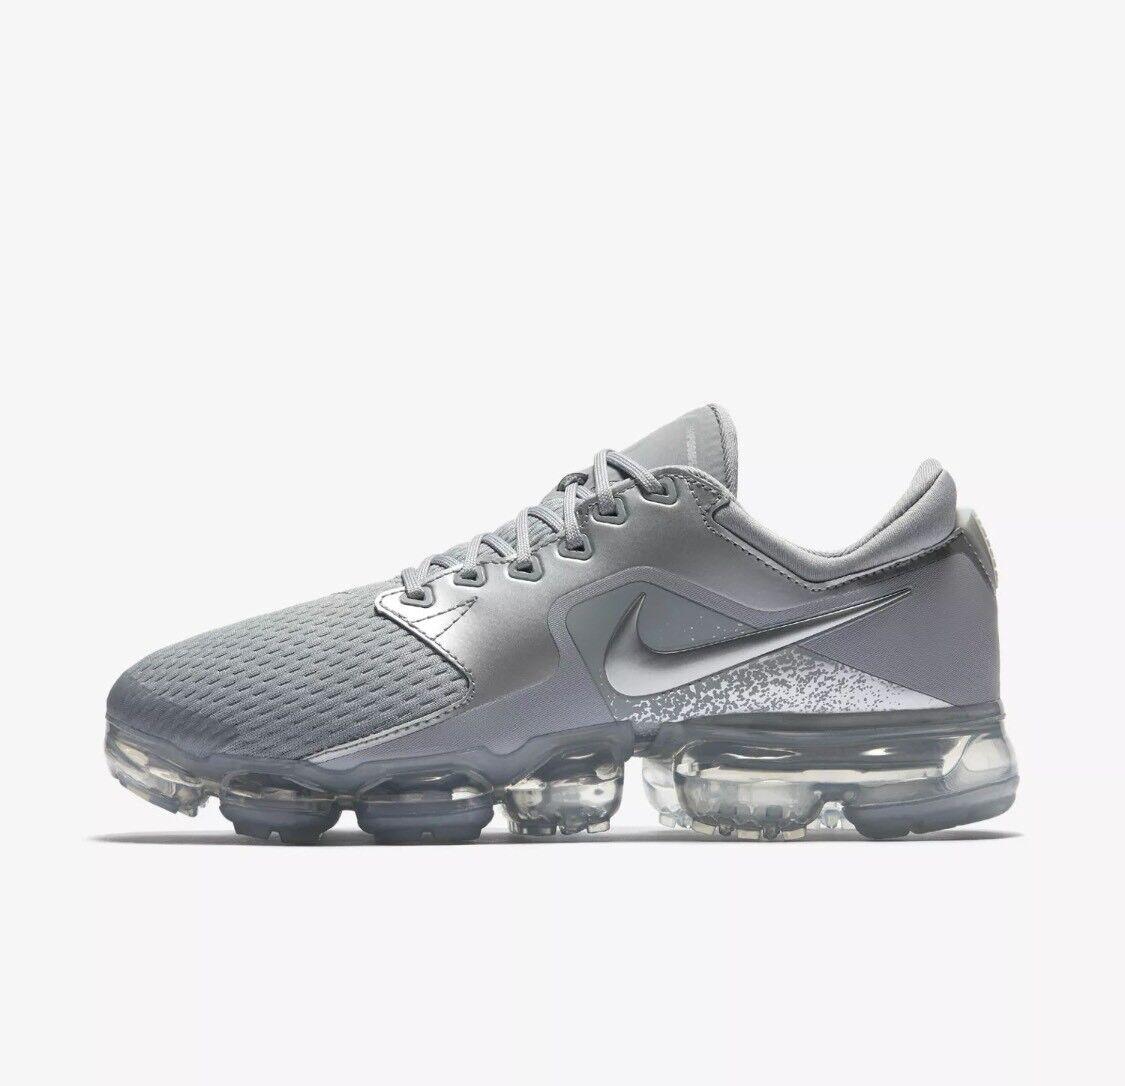 Nike Air Vapormax Wolf Grey Silver Size 6.5 Running Womens AH9045-006